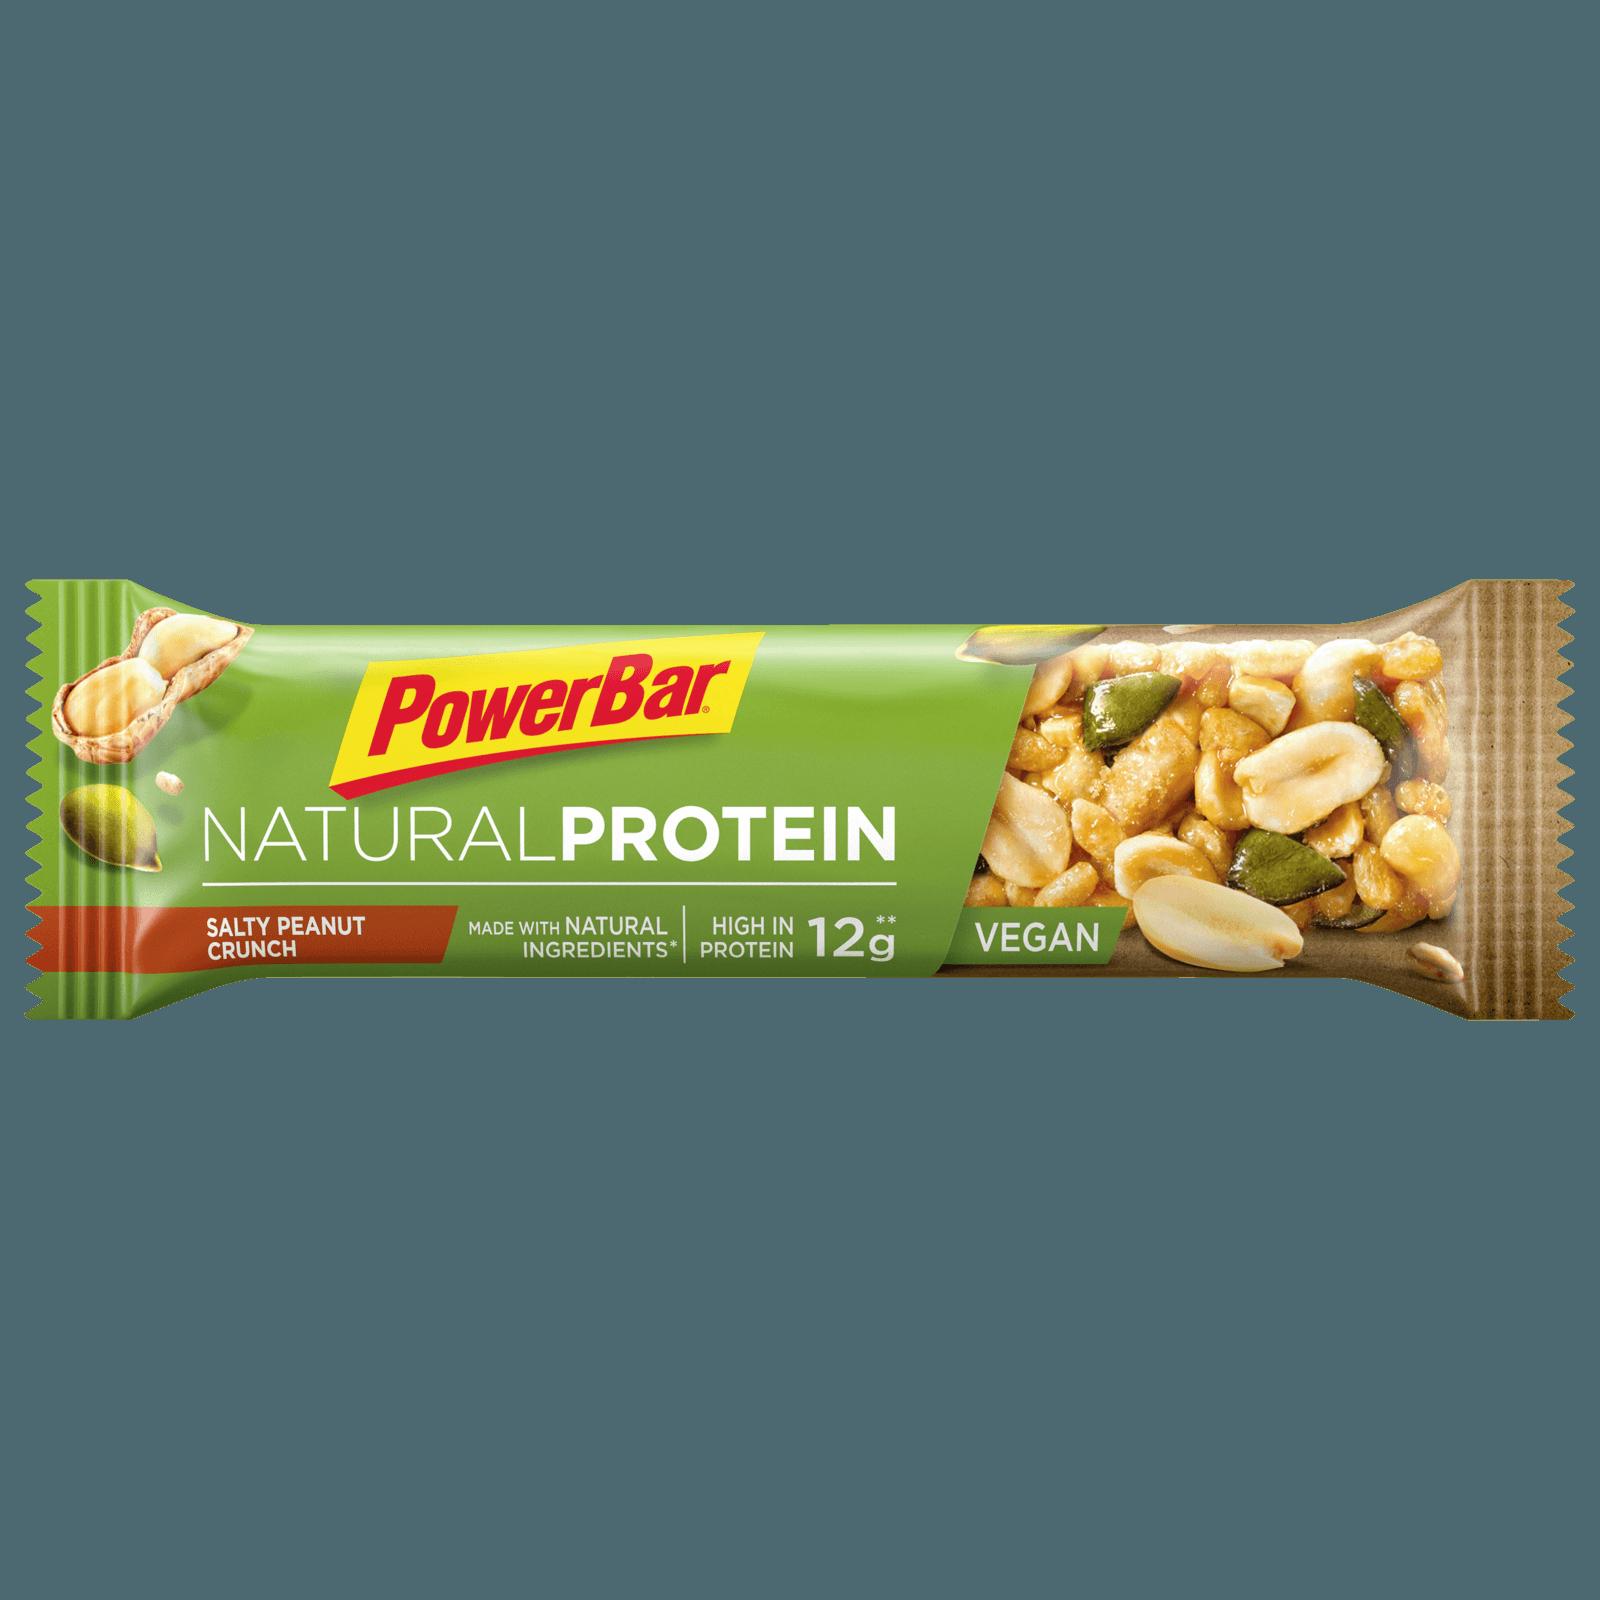 Power Bar Natural Protein Salty Peanut Crunch 40g